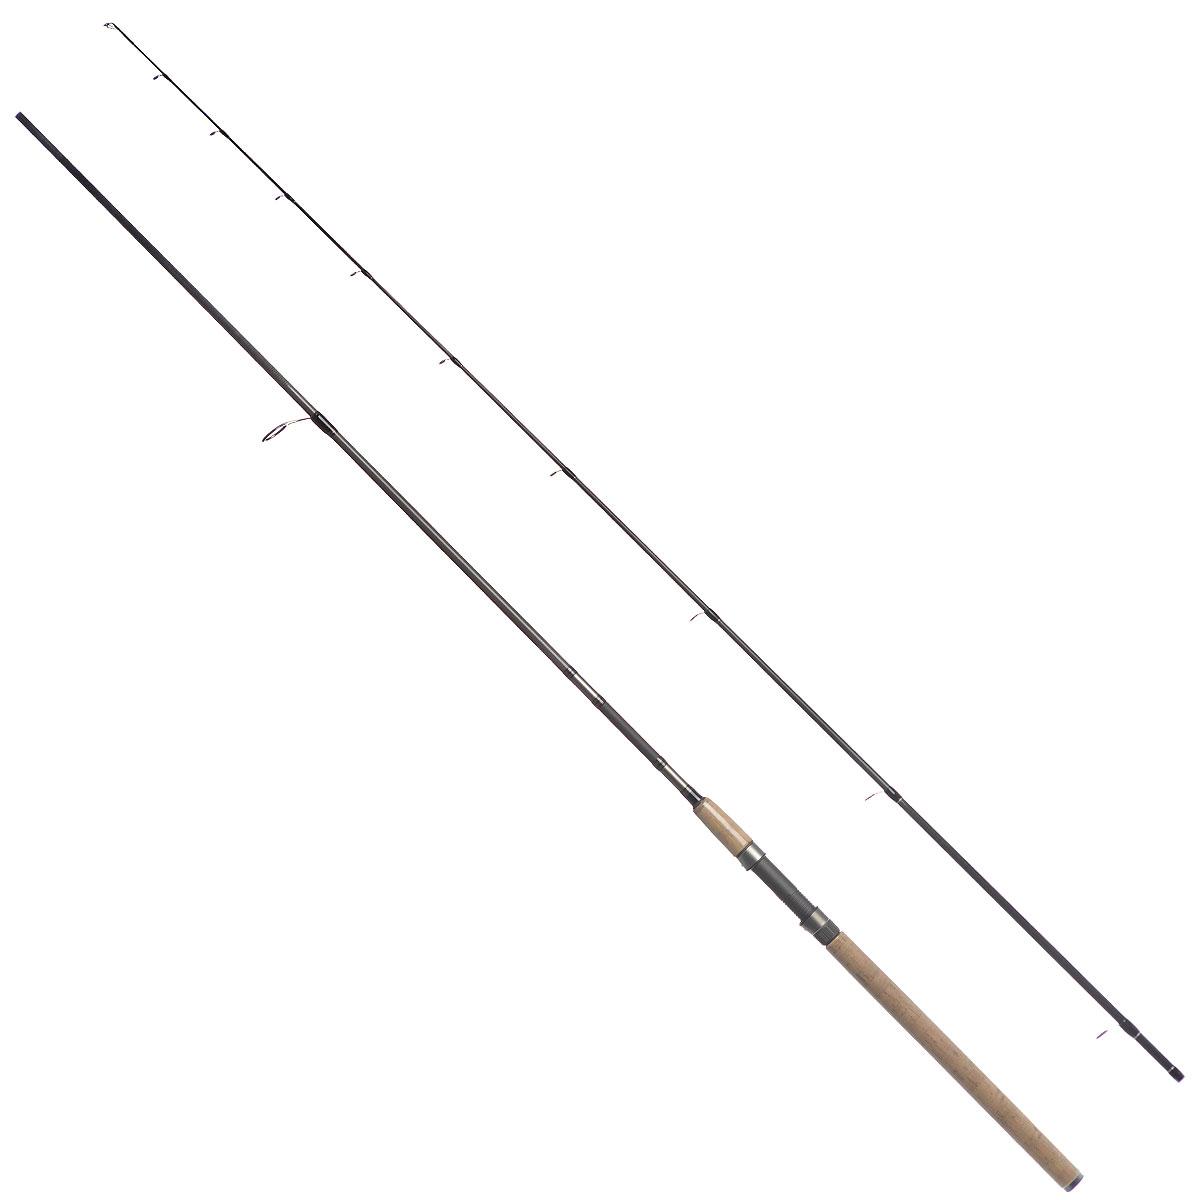 Спиннинг штекерный Daiwa Exceler-RU, 2,90 м, 5-15 г daiwa exceler ru exc ru 962 mfs